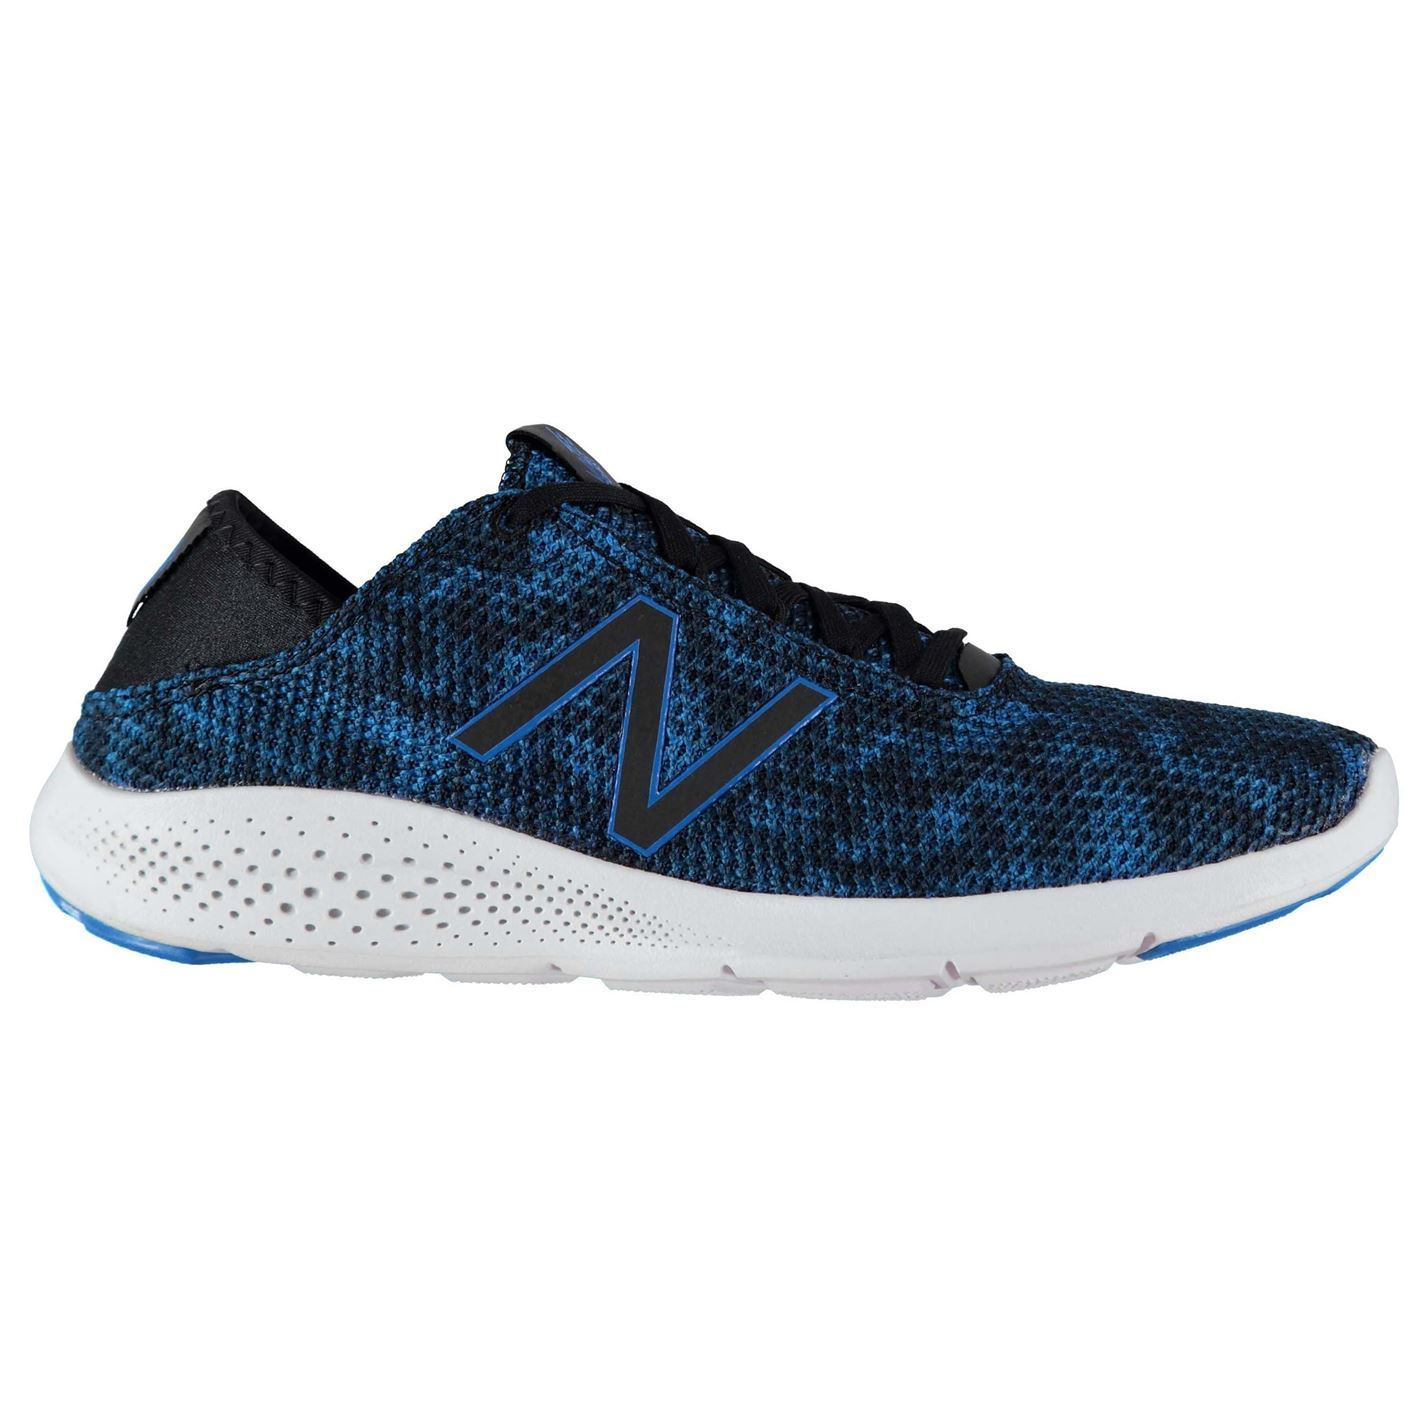 New Balance Knit Mens Amazon Running Shoes